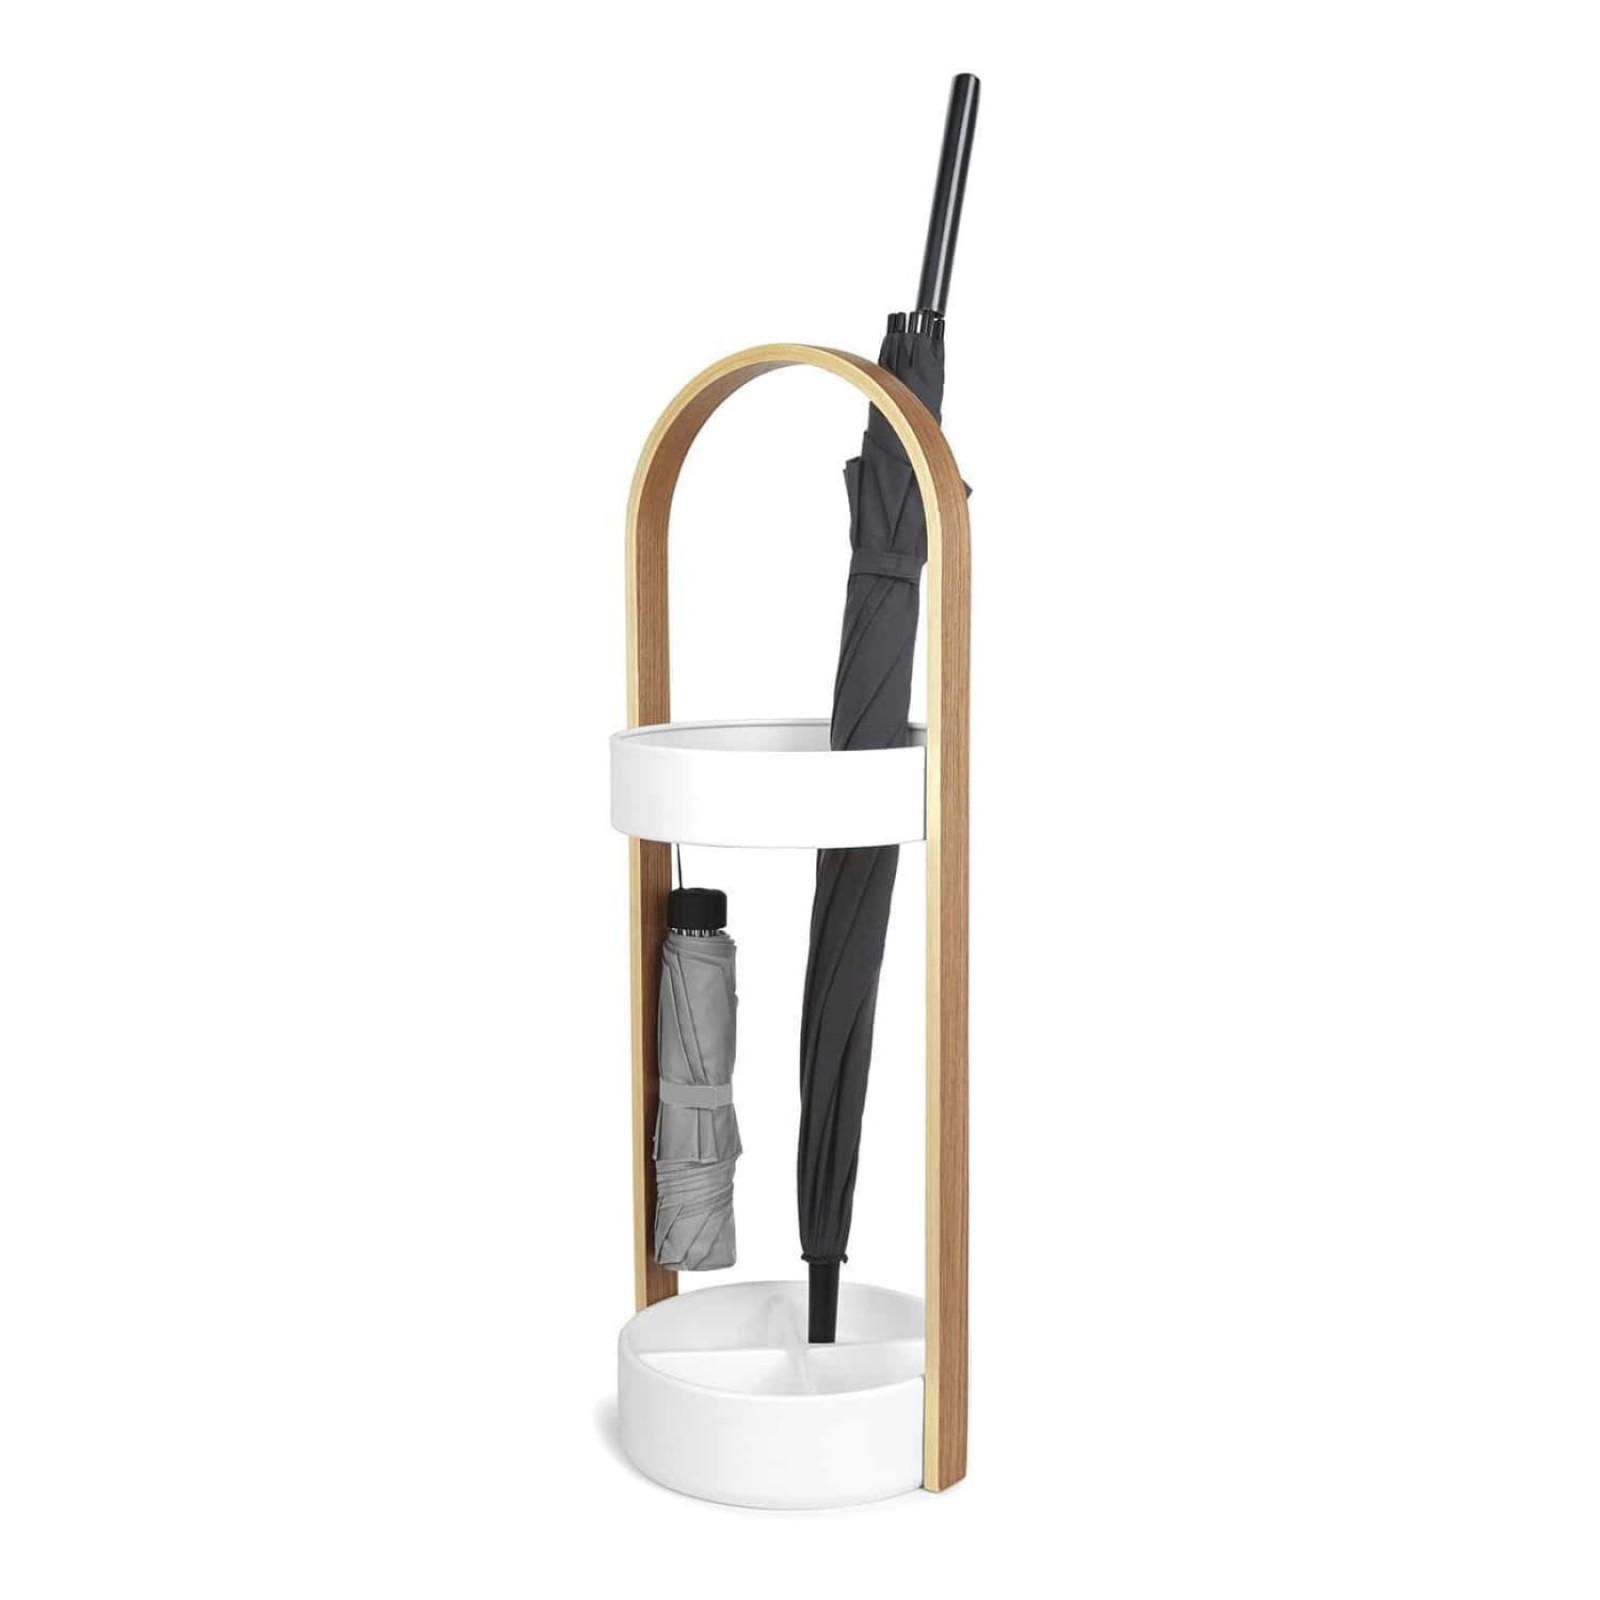 Bellwood Umbrella Stand (White / Natural) - Umbra